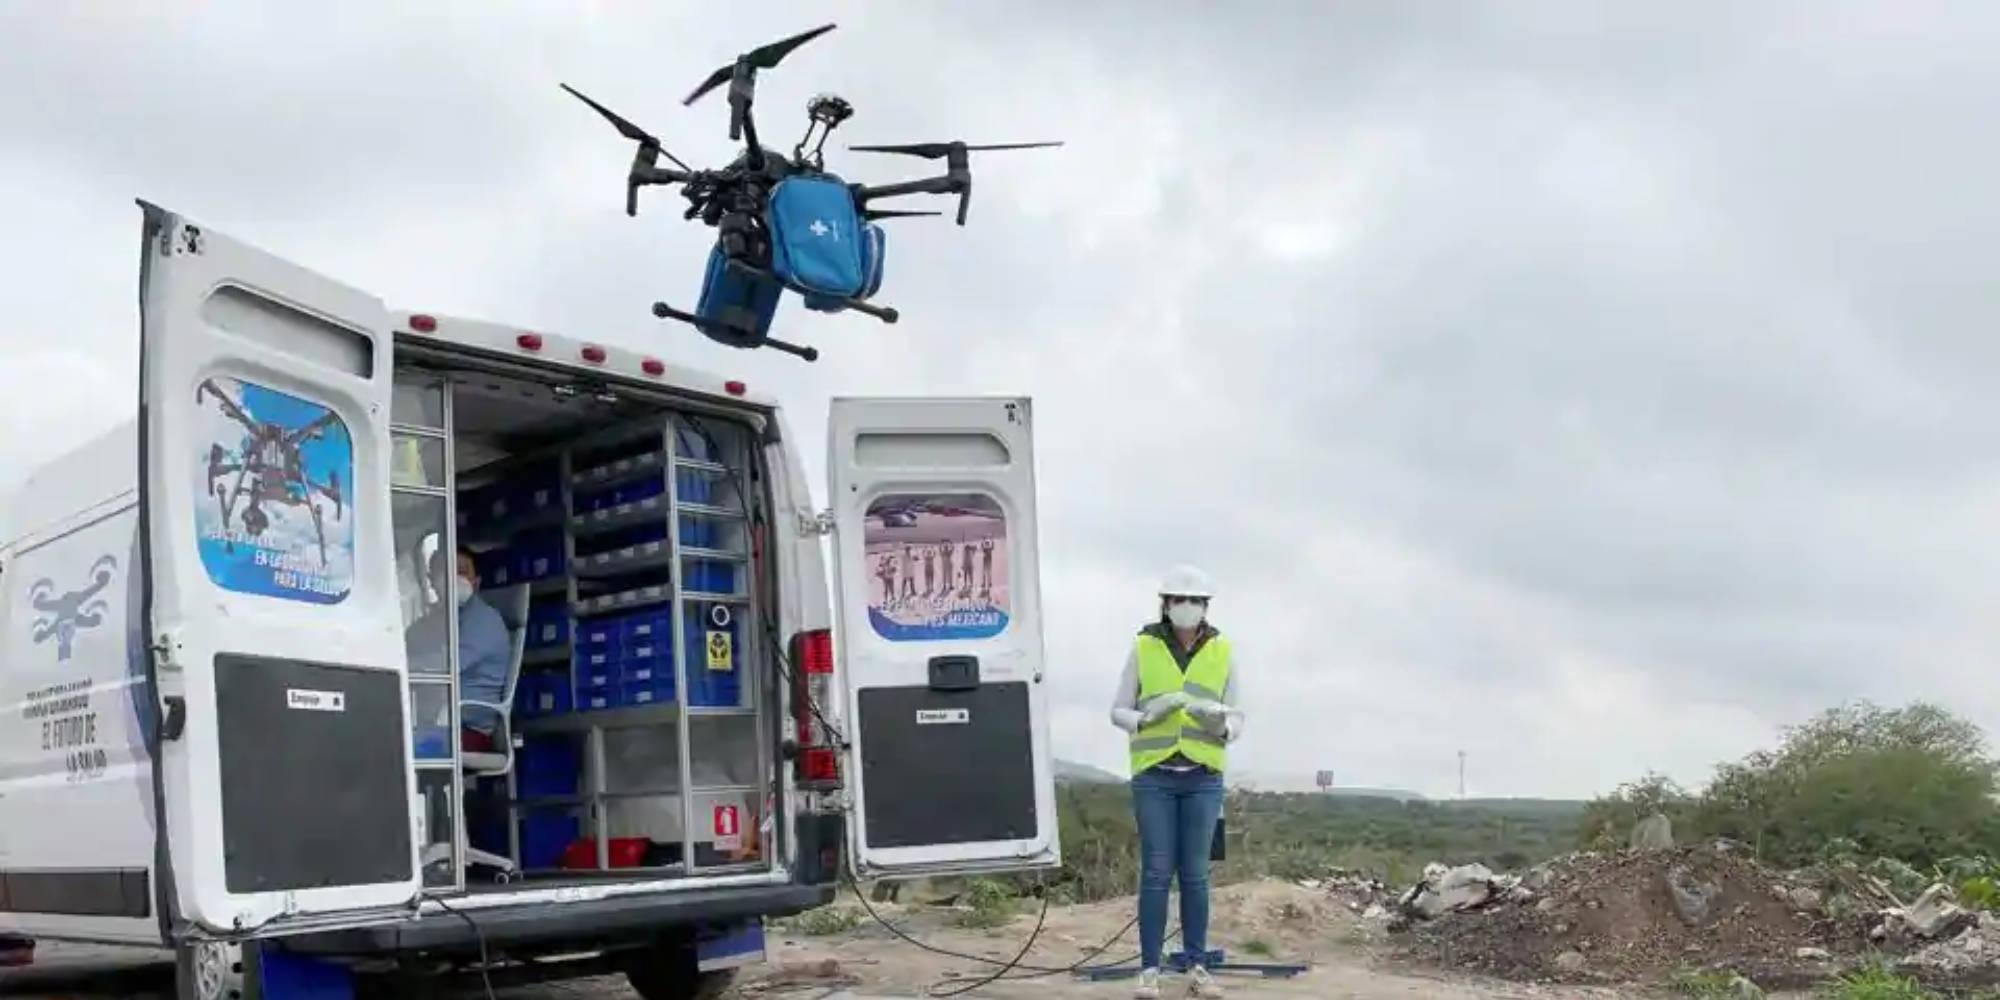 Drones deliver facemasks to Mexican hospitals - DroneDJ